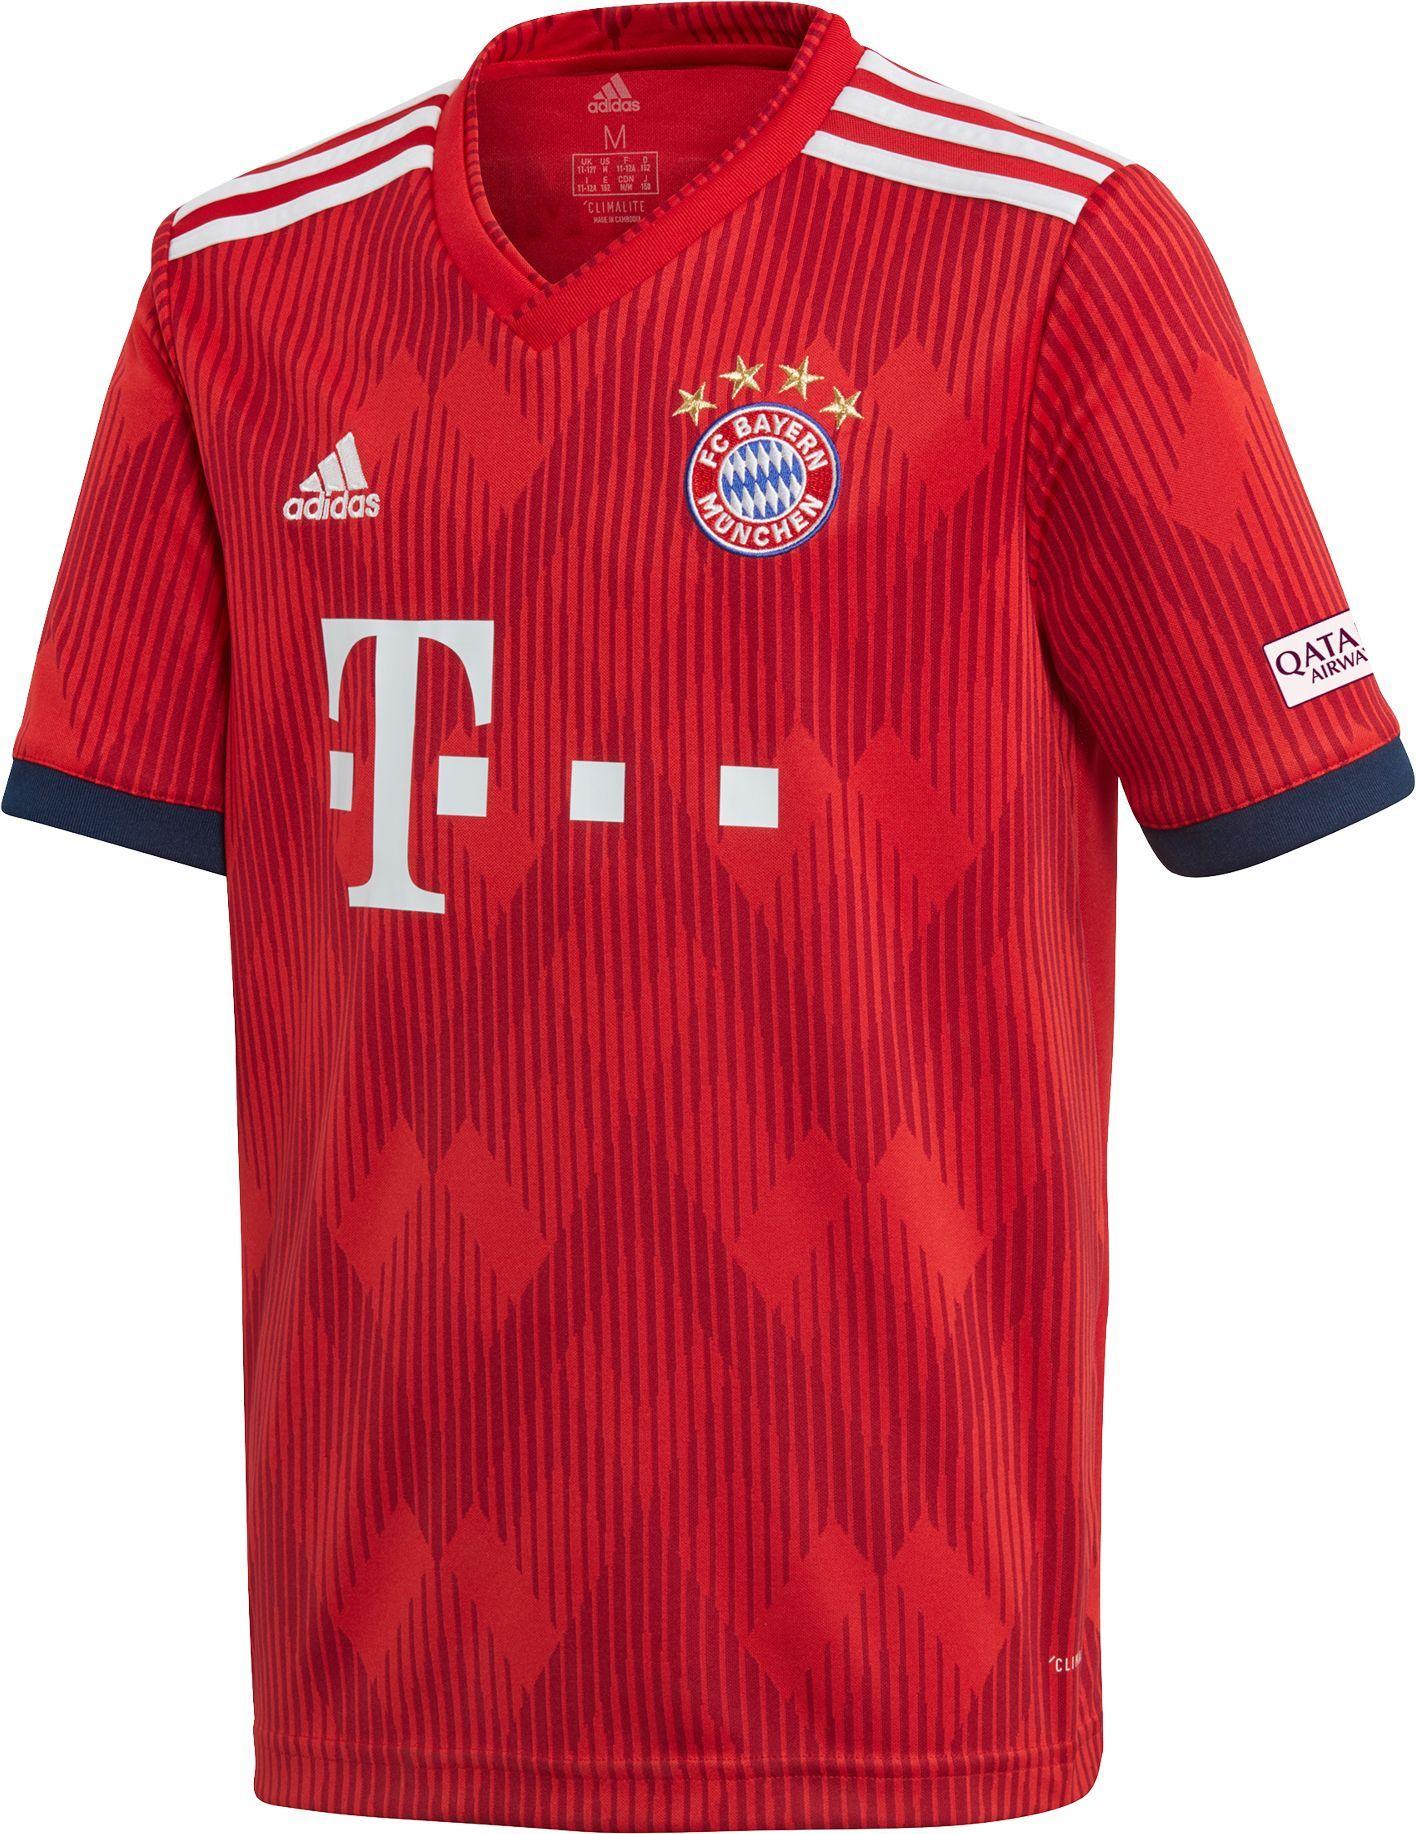 save off 56d58 f2999 adidas Youth Bayern Munich 2018 Stadium Home Replica Jersey ...